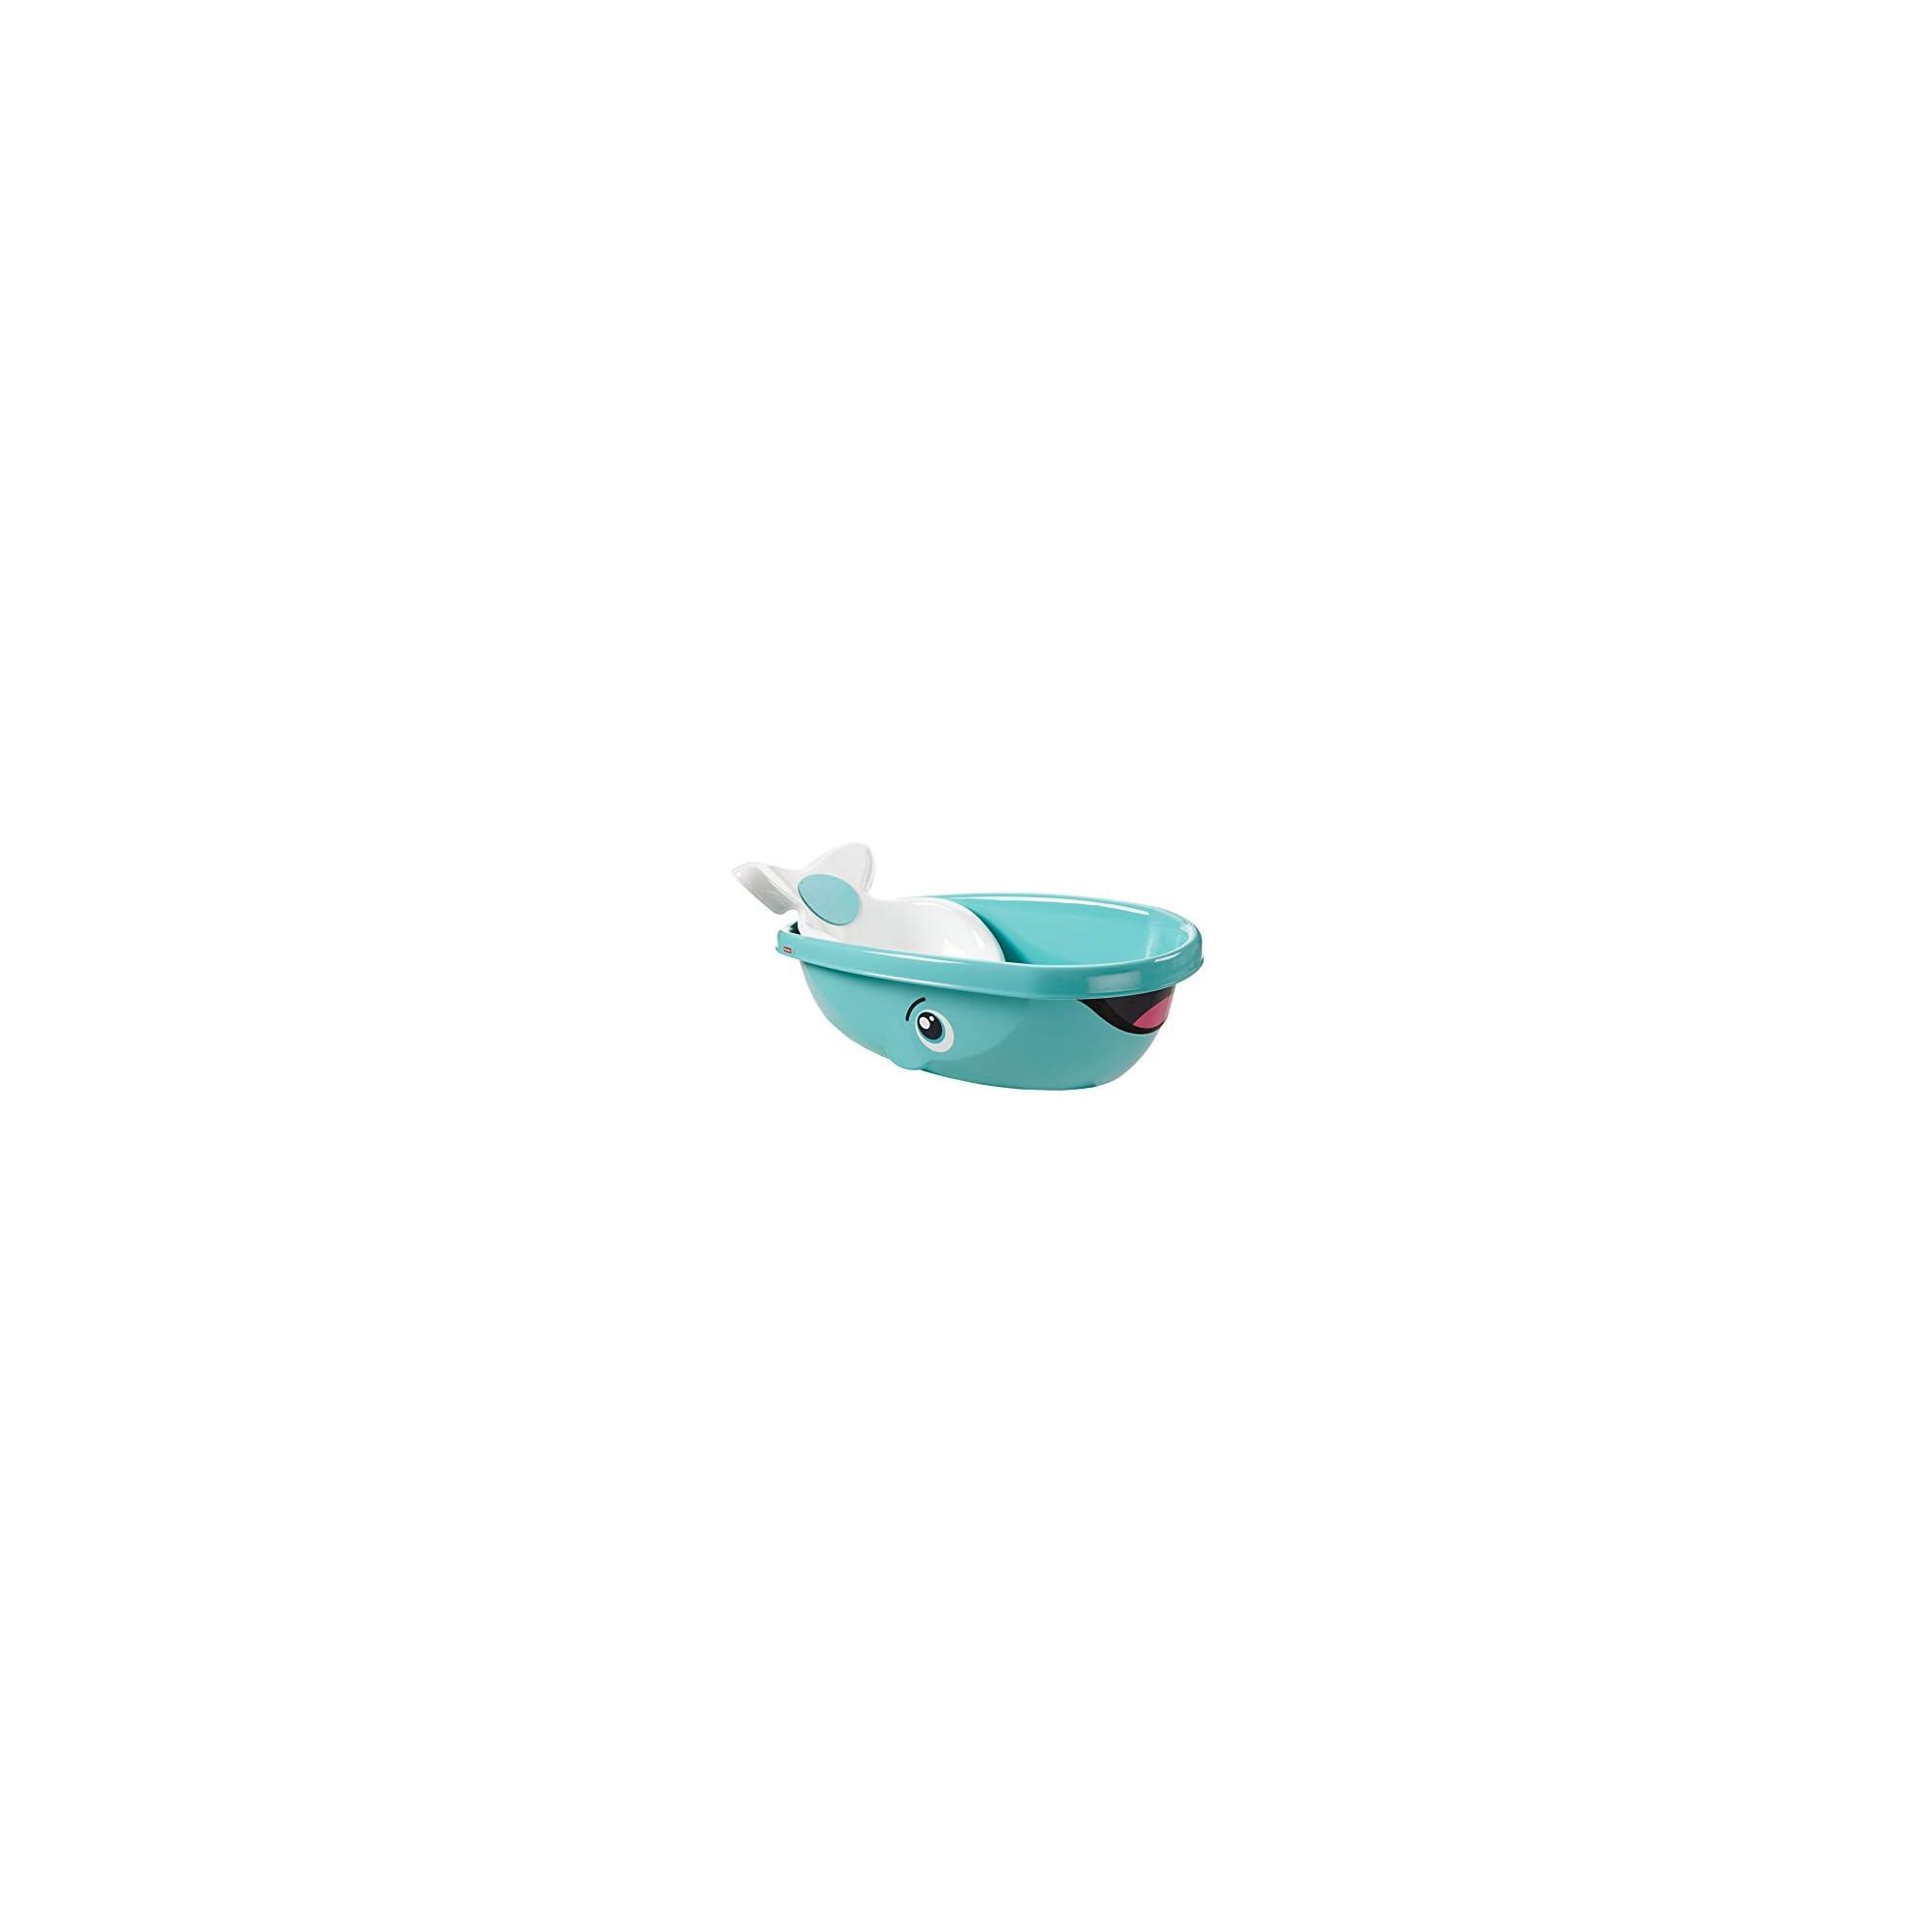 Fisher-Price Whale of a Tub Bathtub